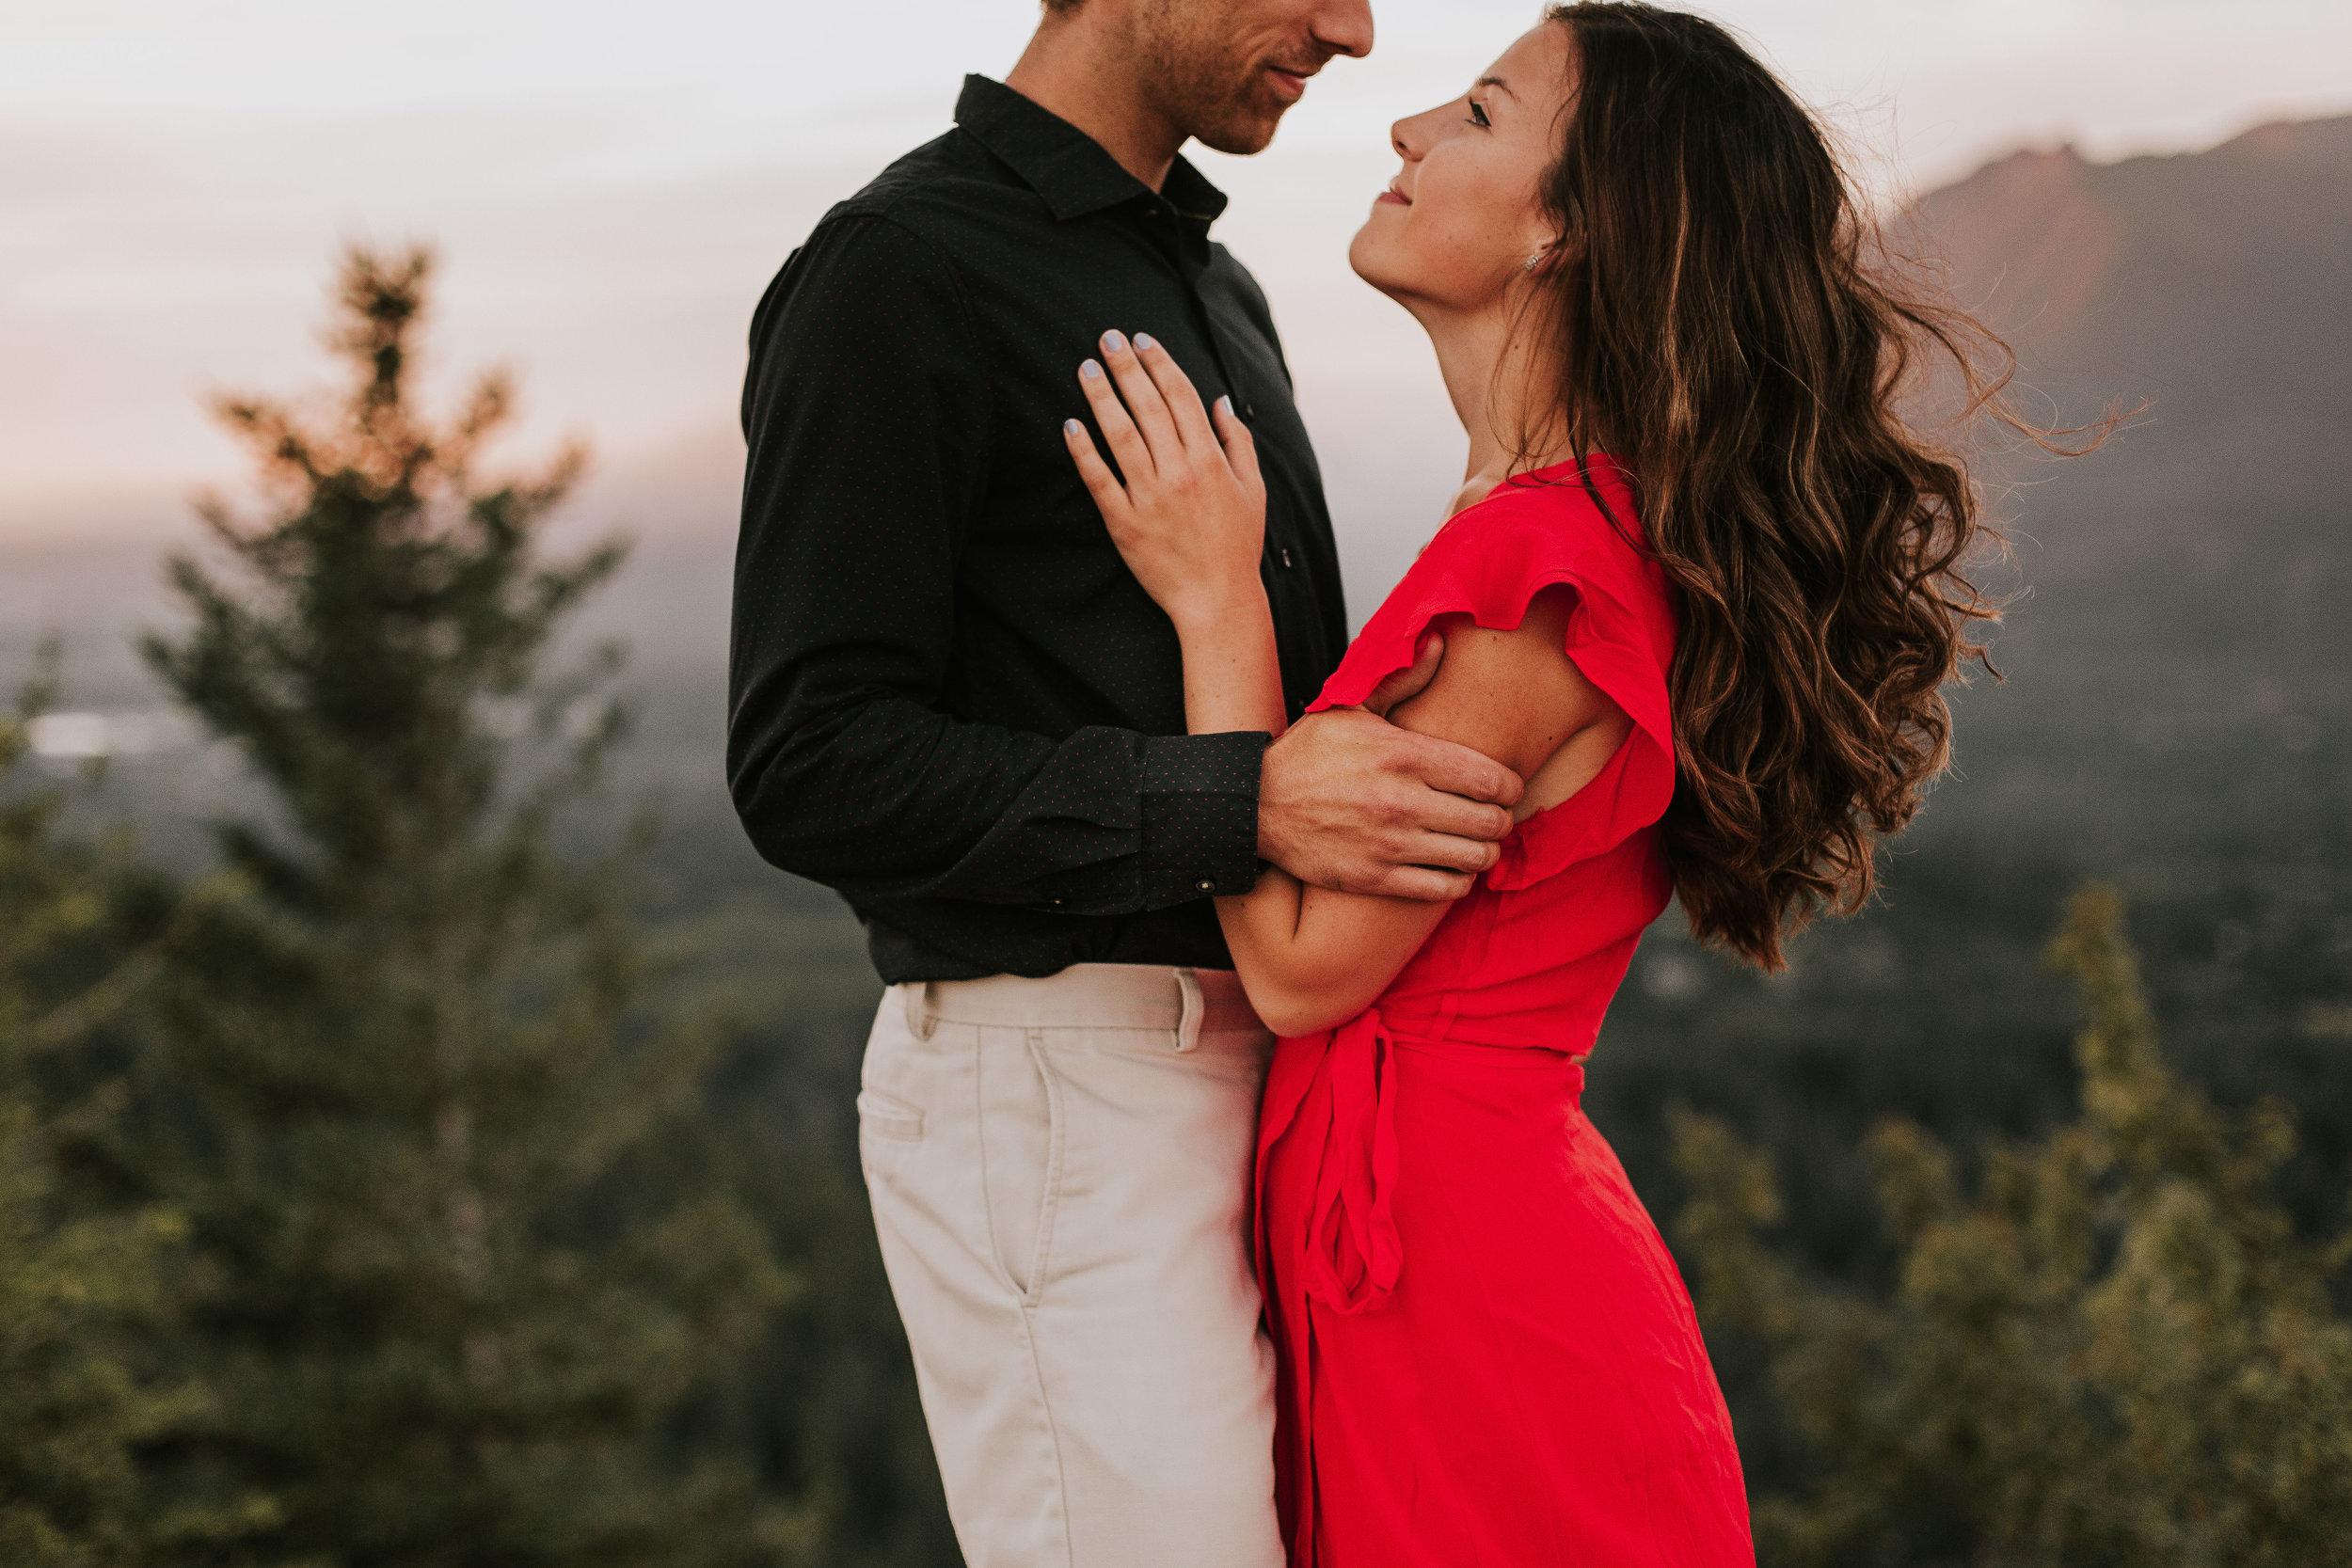 nicole-daacke-photography-rattlesnake-ridge-adventurous-engagement-session-hiking-seattle-washington-destinatino-elopement-intimate-wedding-photographer-14.jpg